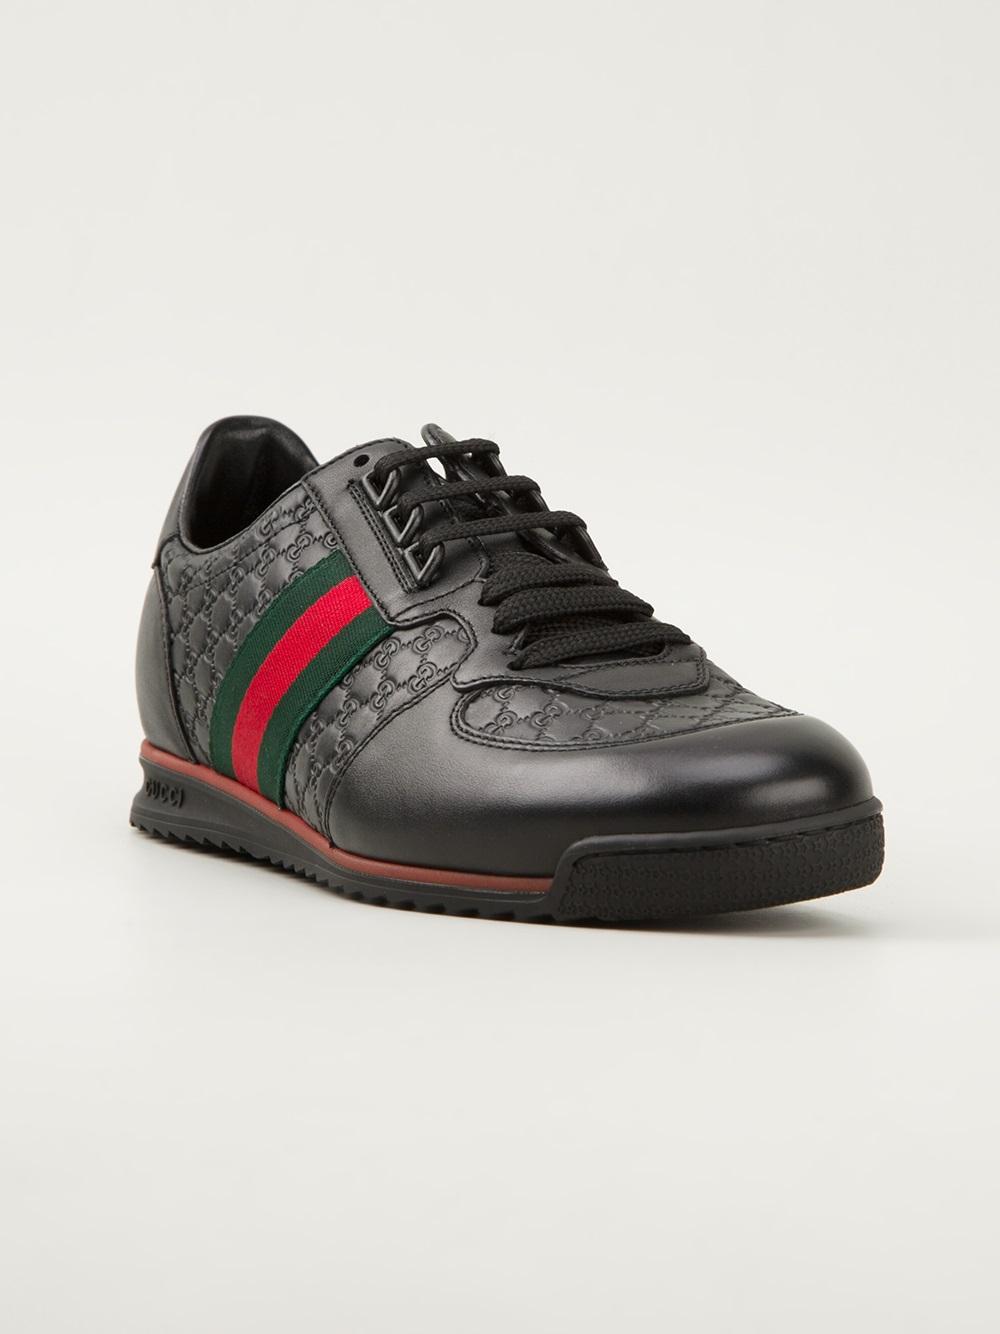 Gucci Monogram Embossed Sneakers in